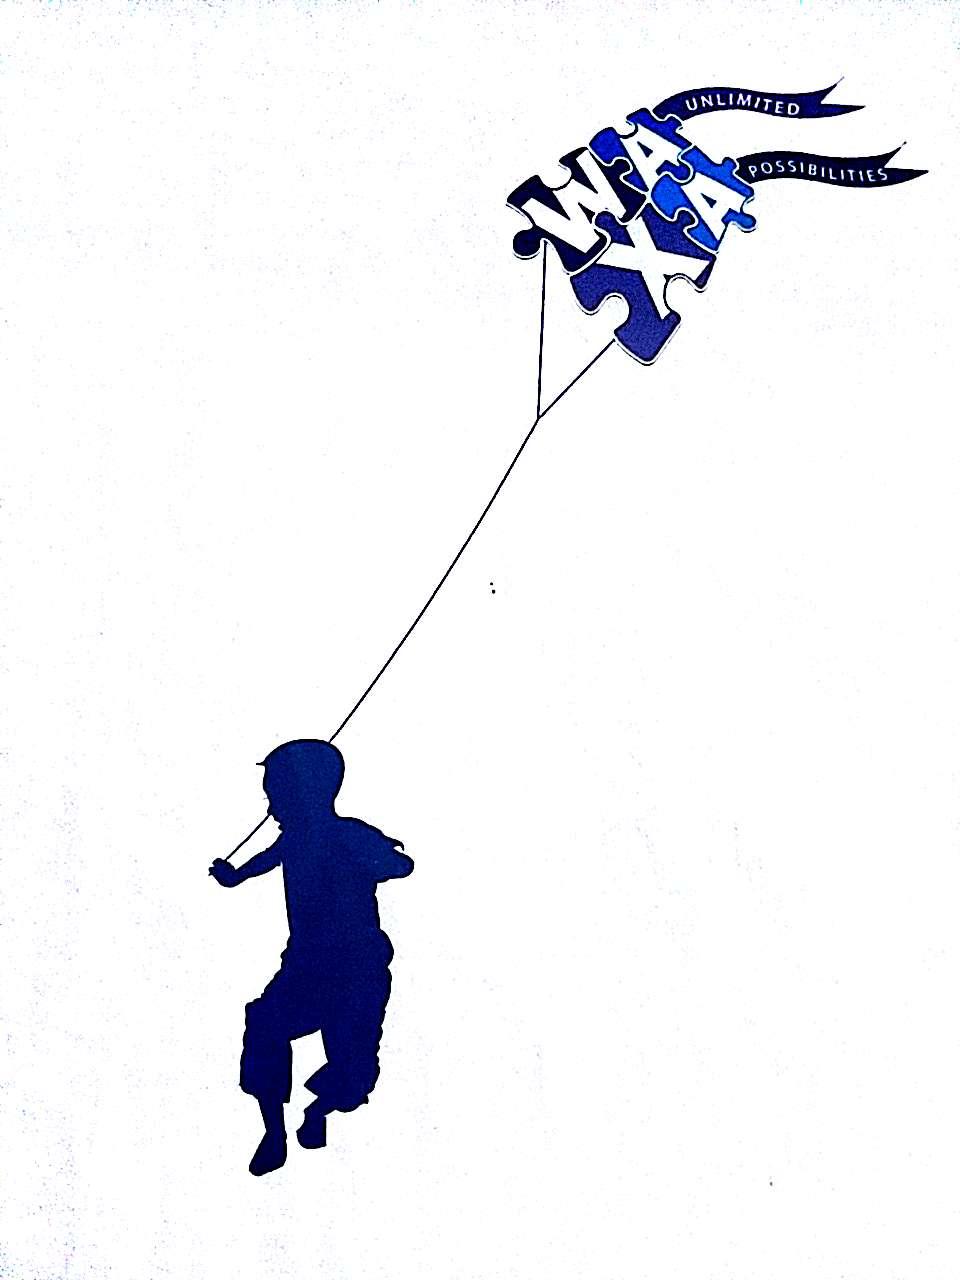 WalllynZavy's Autistic Kids Can Do!  Inc   5013c Non-Profit image